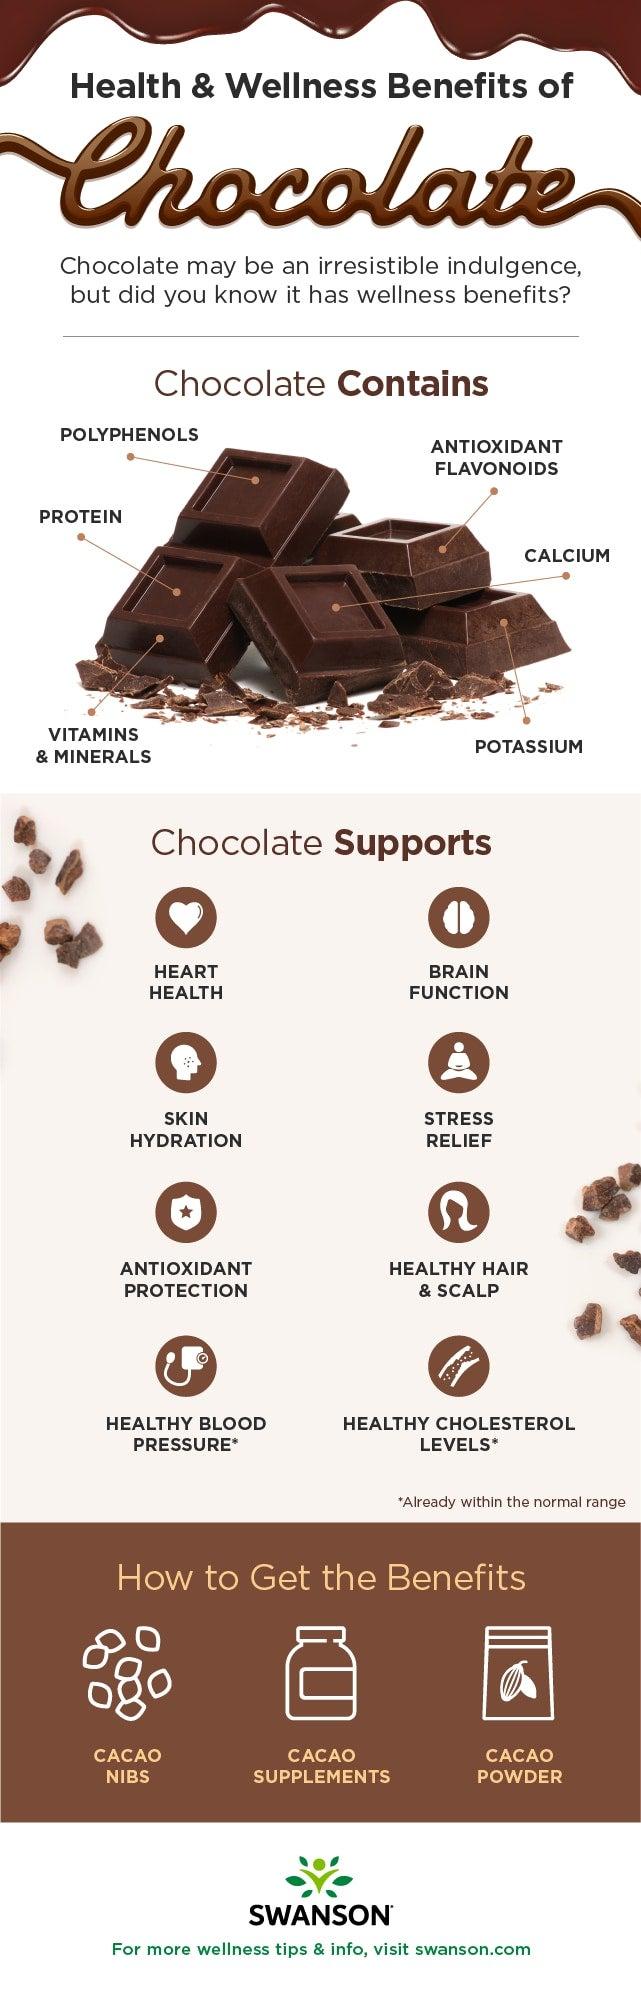 Benefits of Chocolate Infographic